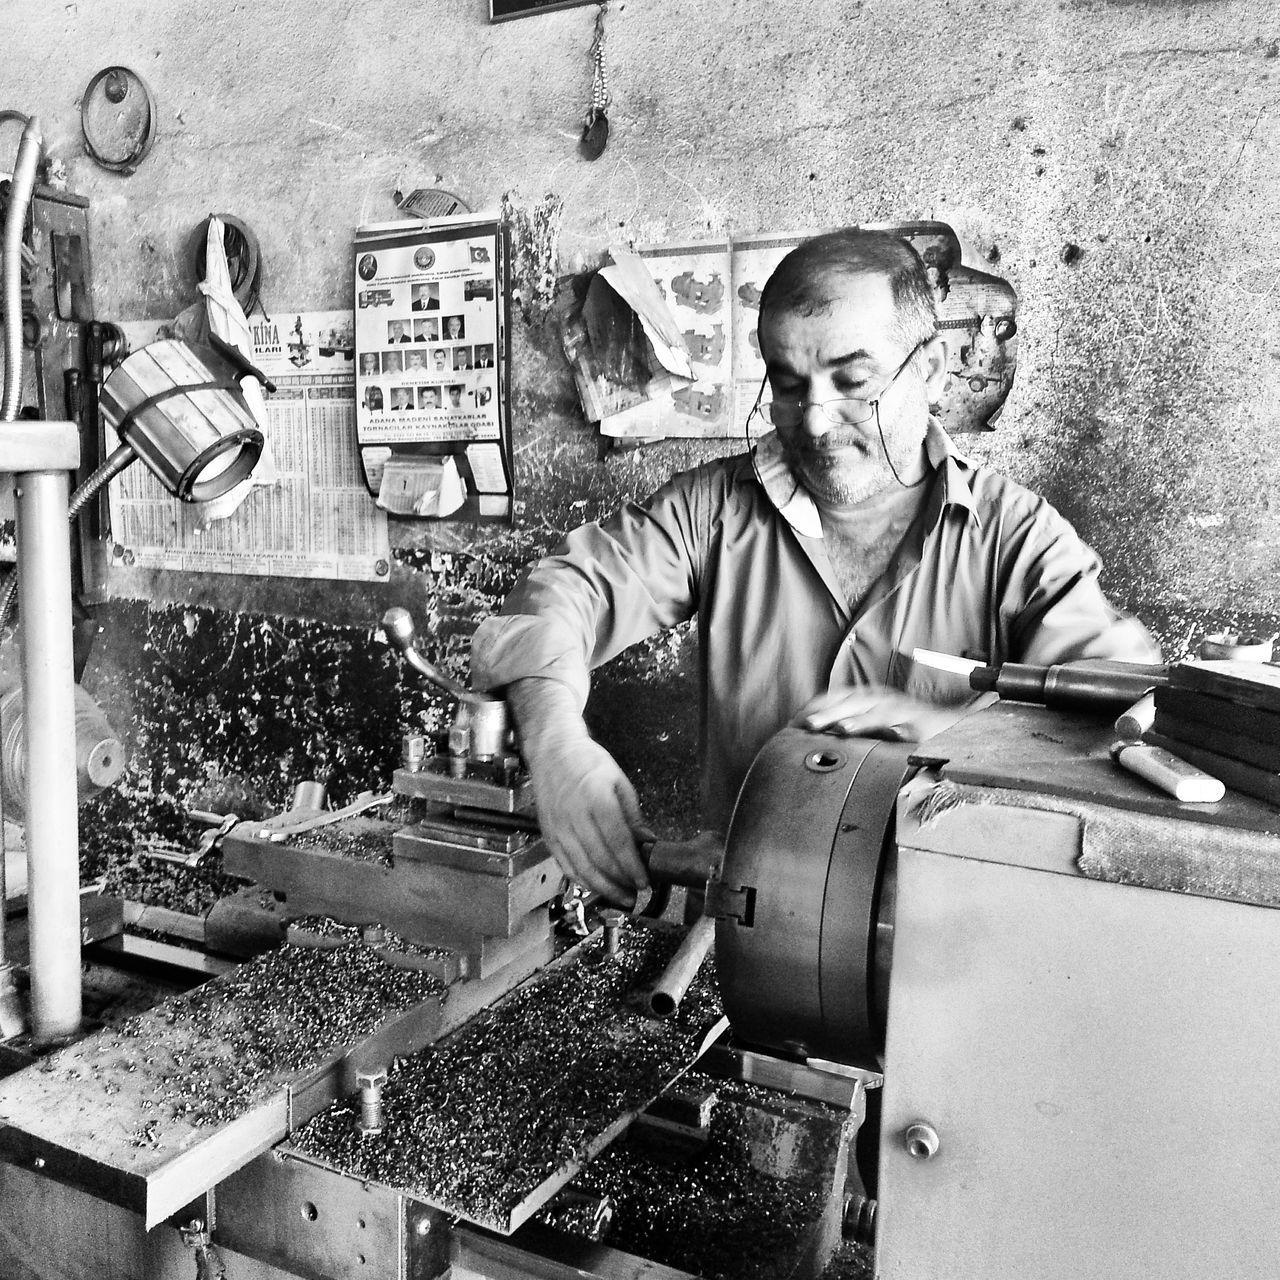 Man working on lathe